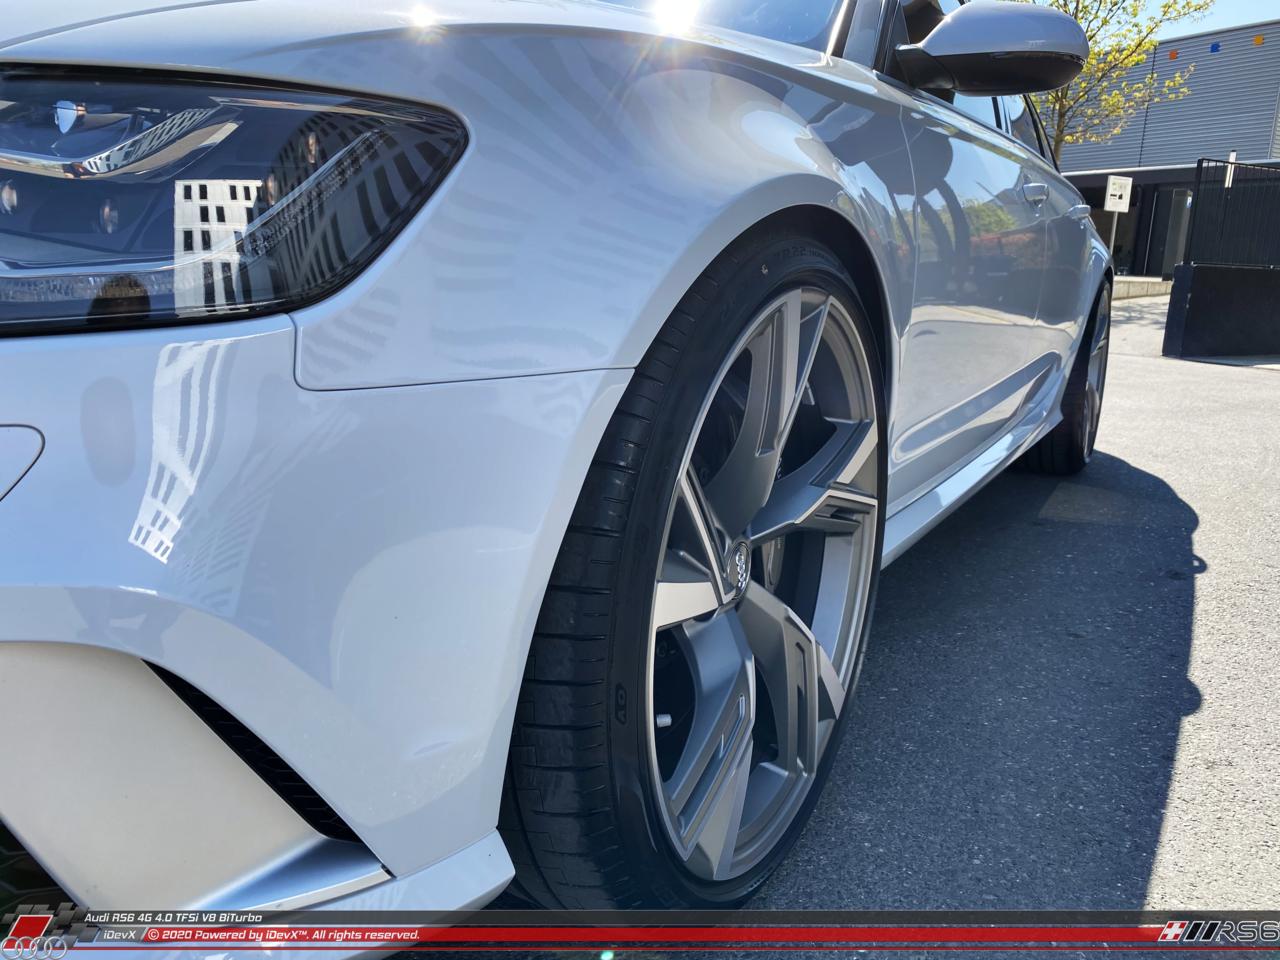 24.04.2020_Audi-RS6_iDevX_003.png